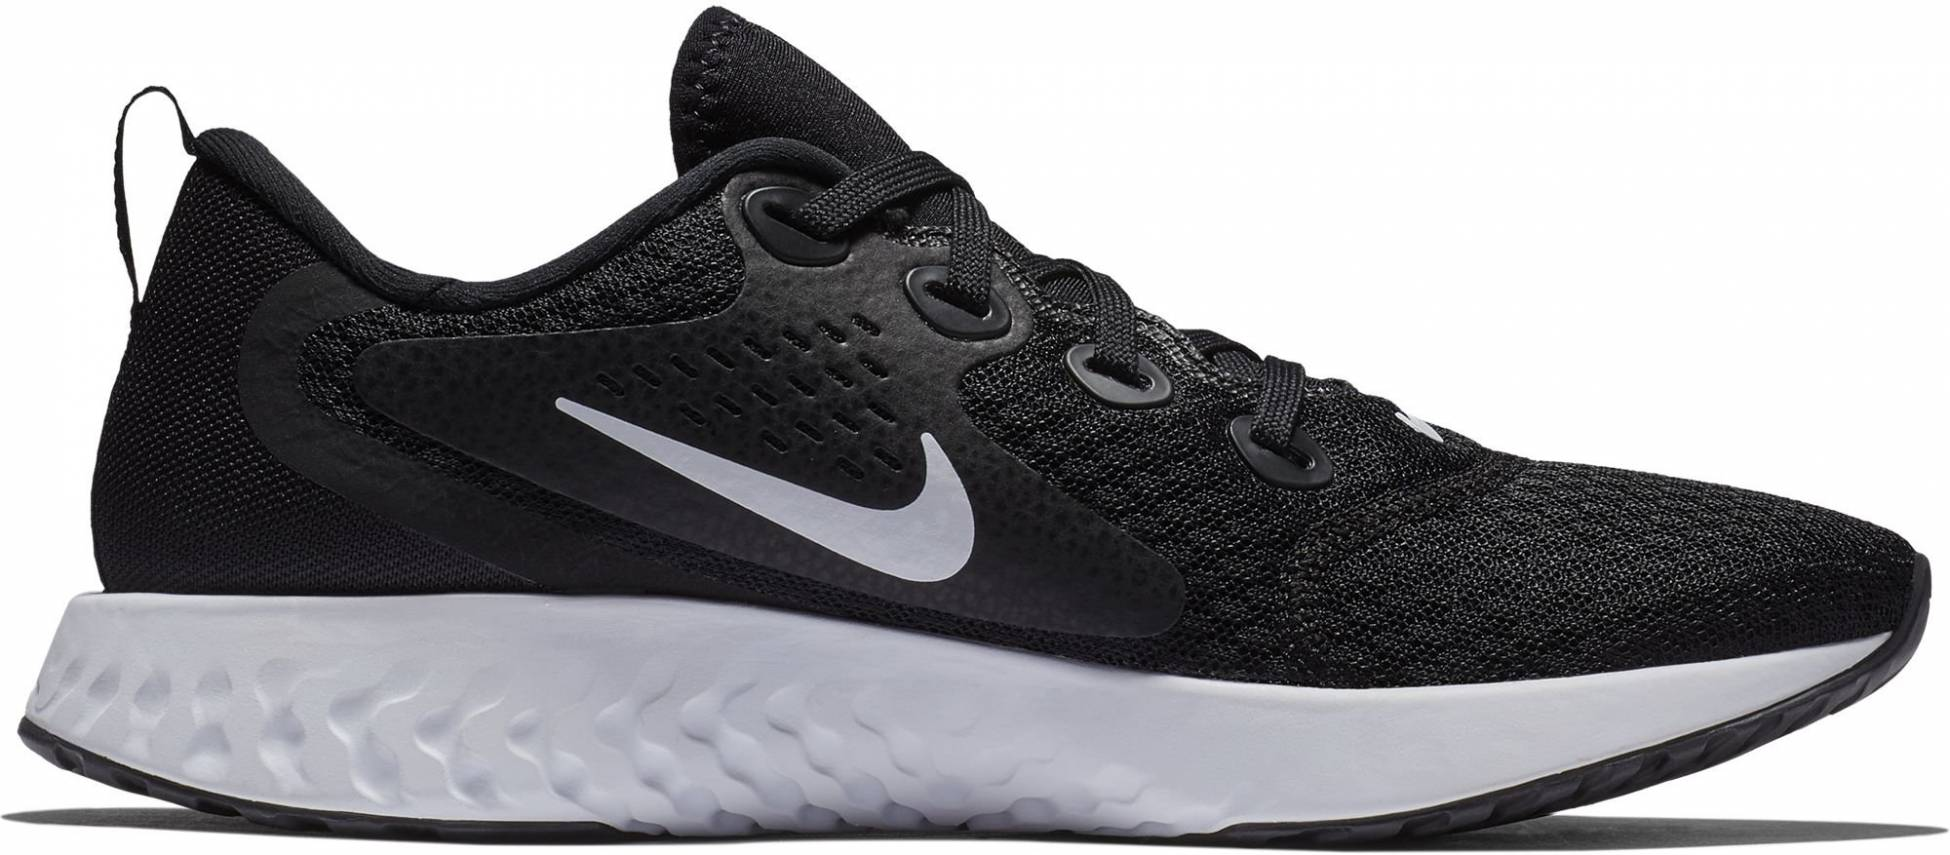 Nike Legend React - Deals ($85), Facts, Reviews (2021) | RunRepeat